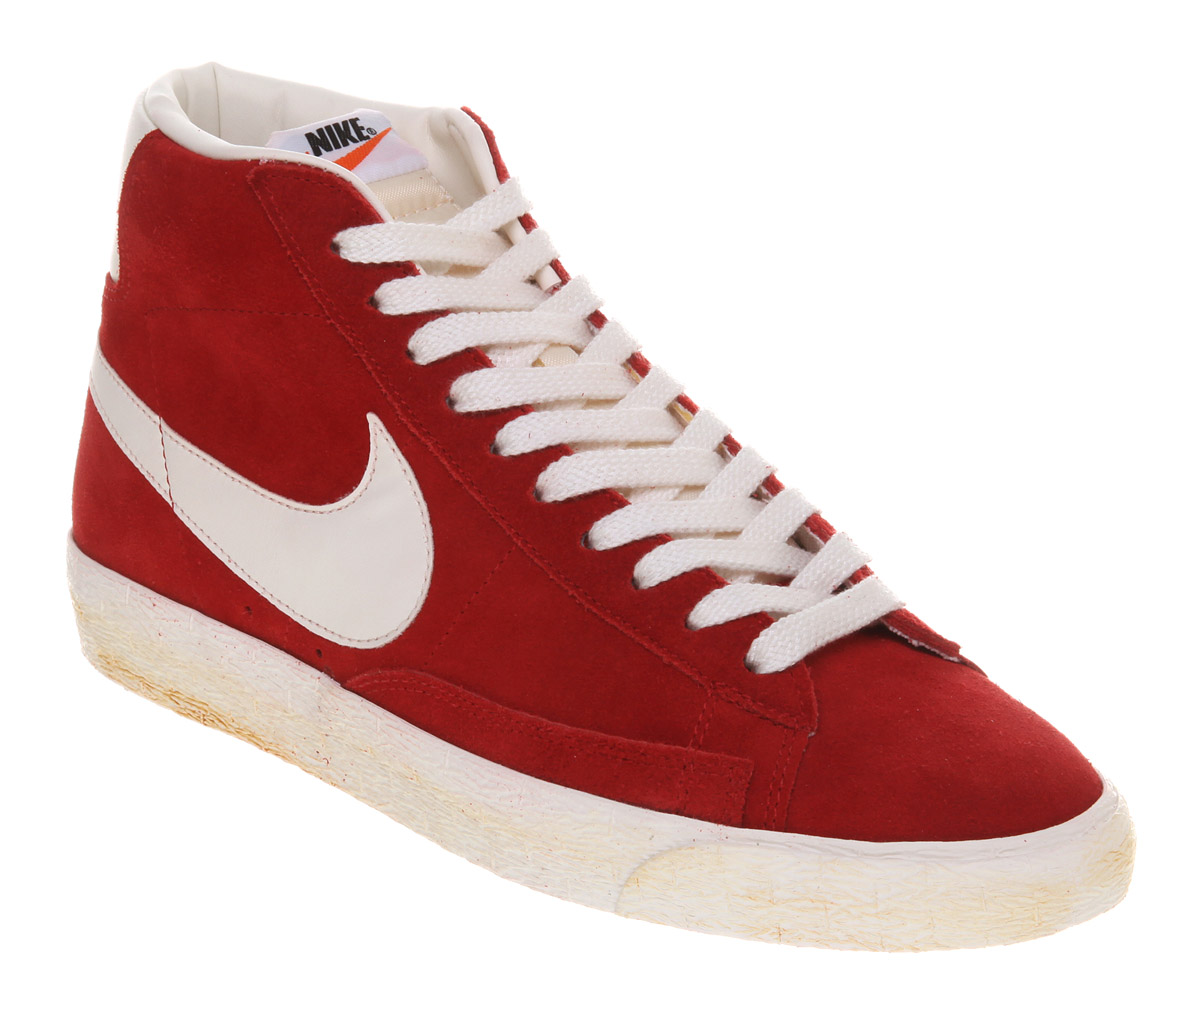 Nike-Blazer-Vintage-Hi-Suede-Red-Sail-Hi-Suede-Nike-Trainers-Blazer